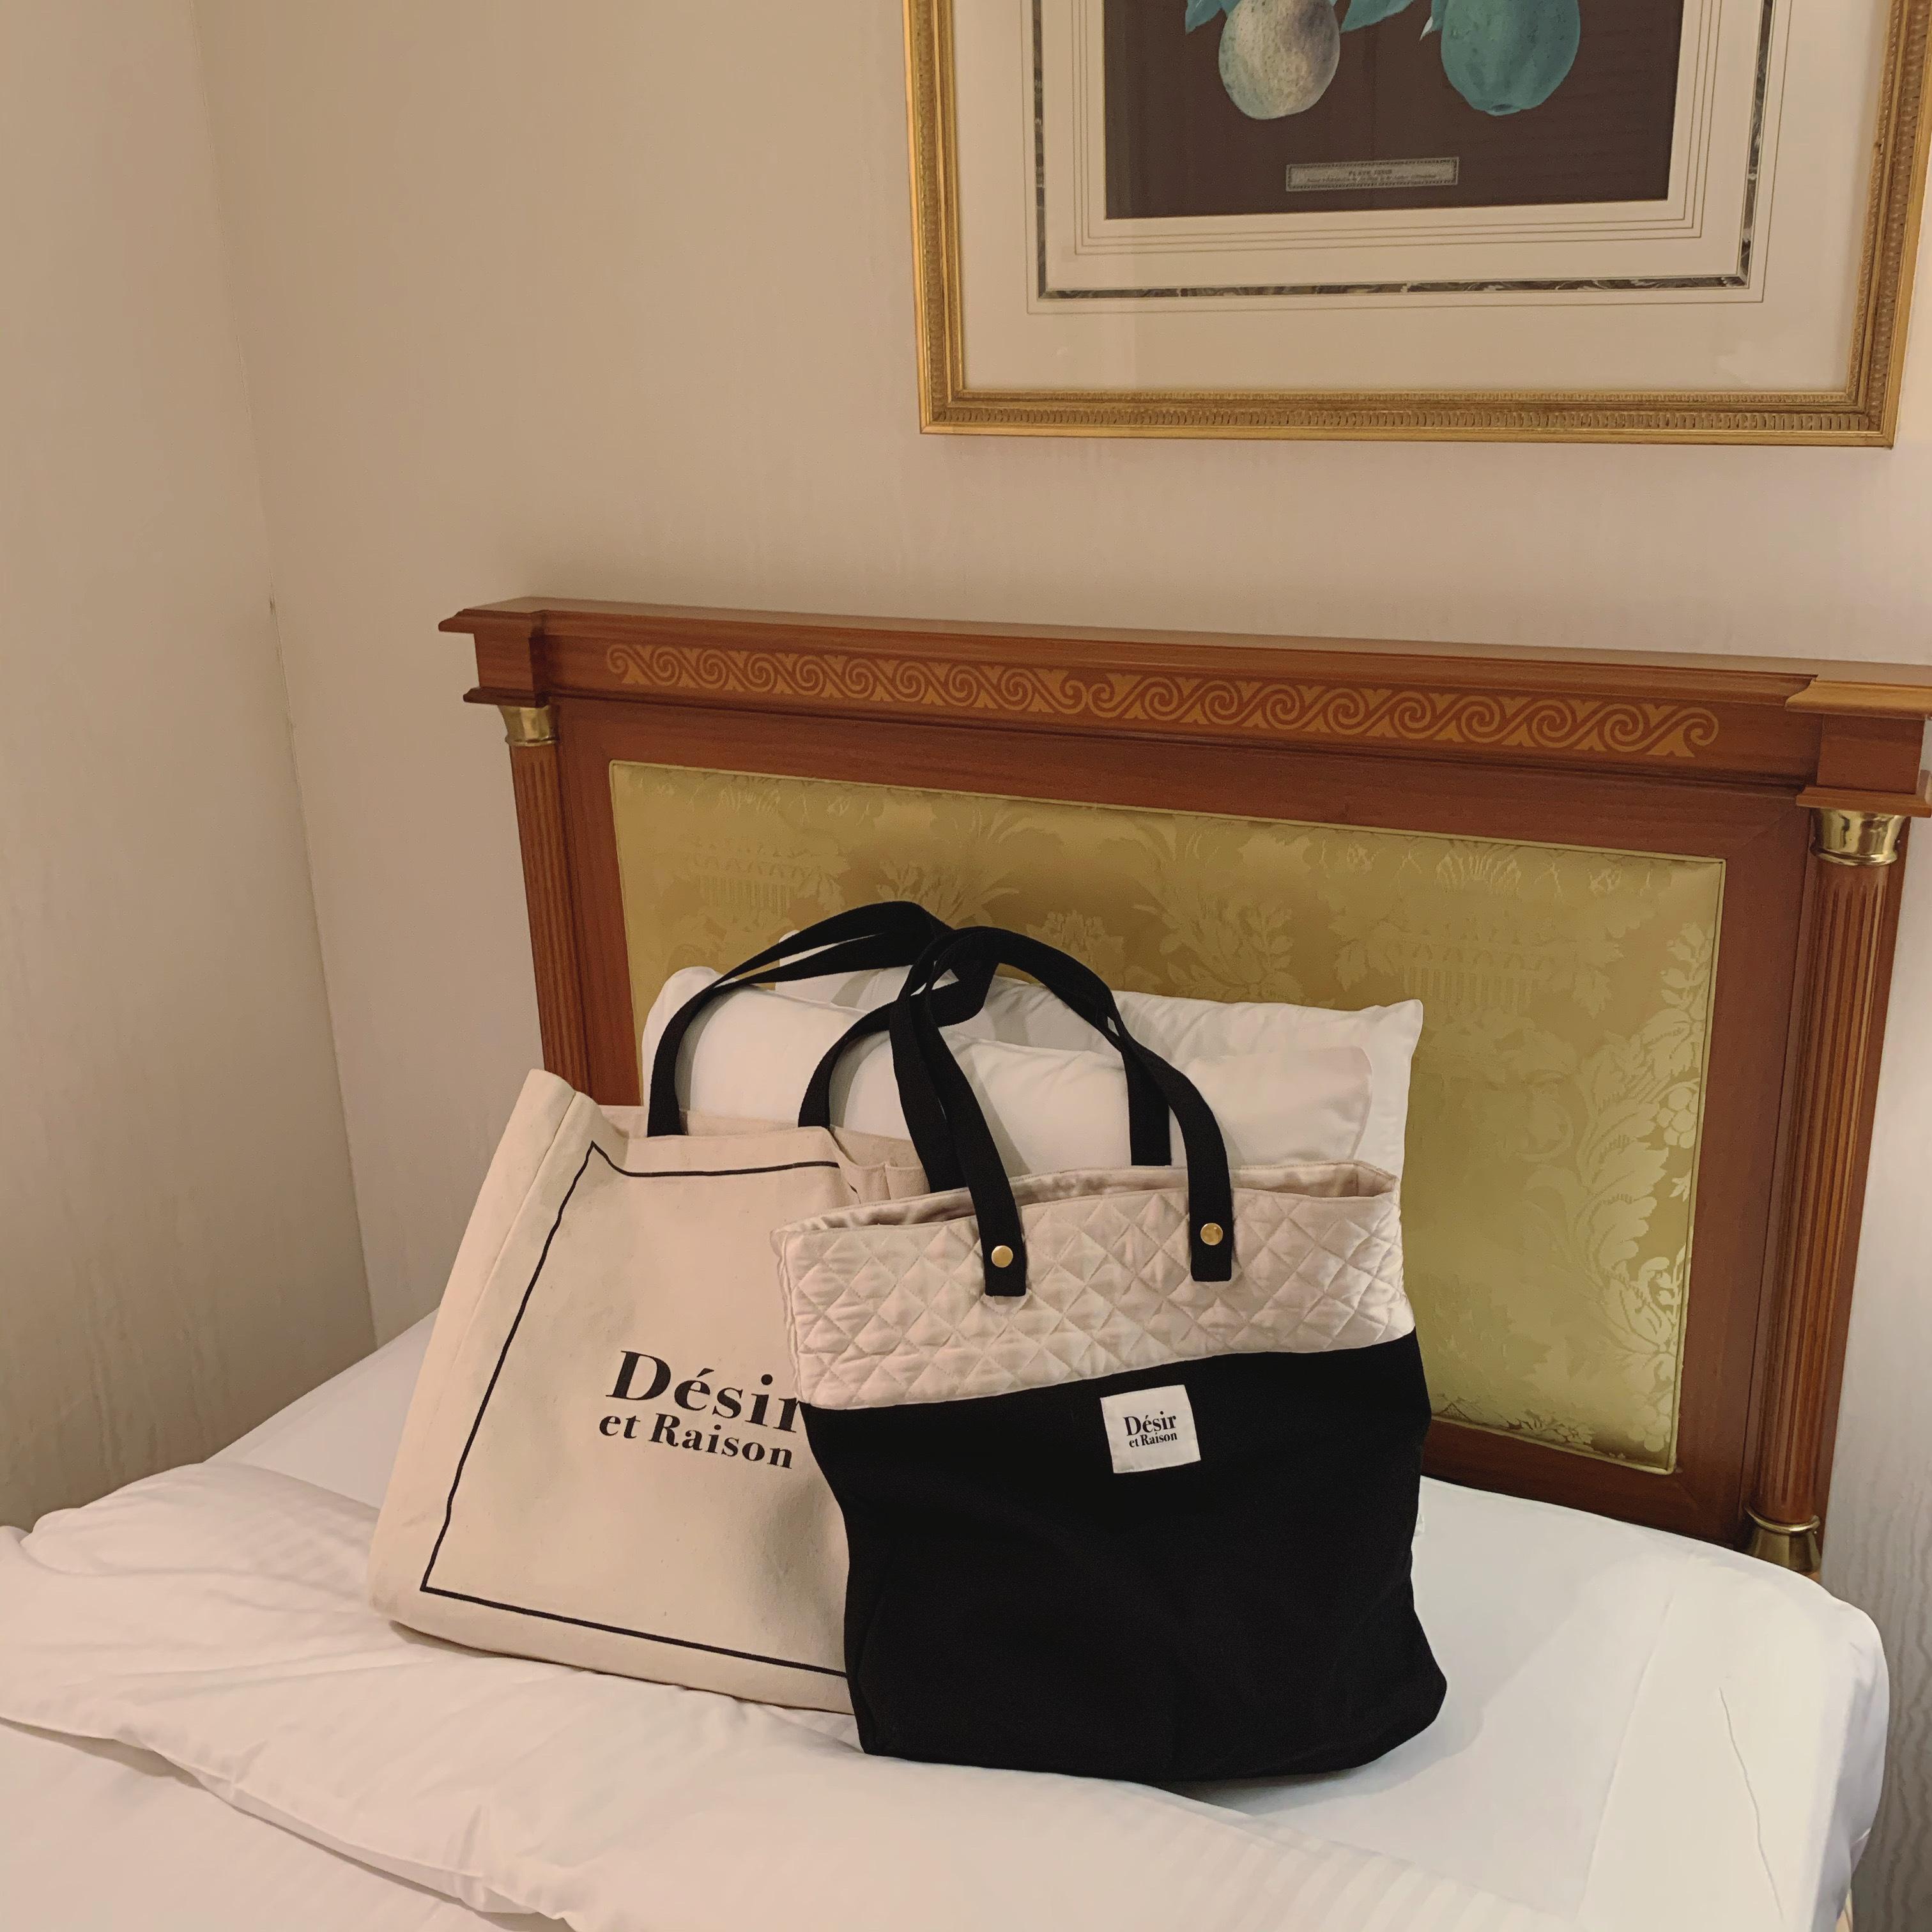 【Désir original】quilting tote bag